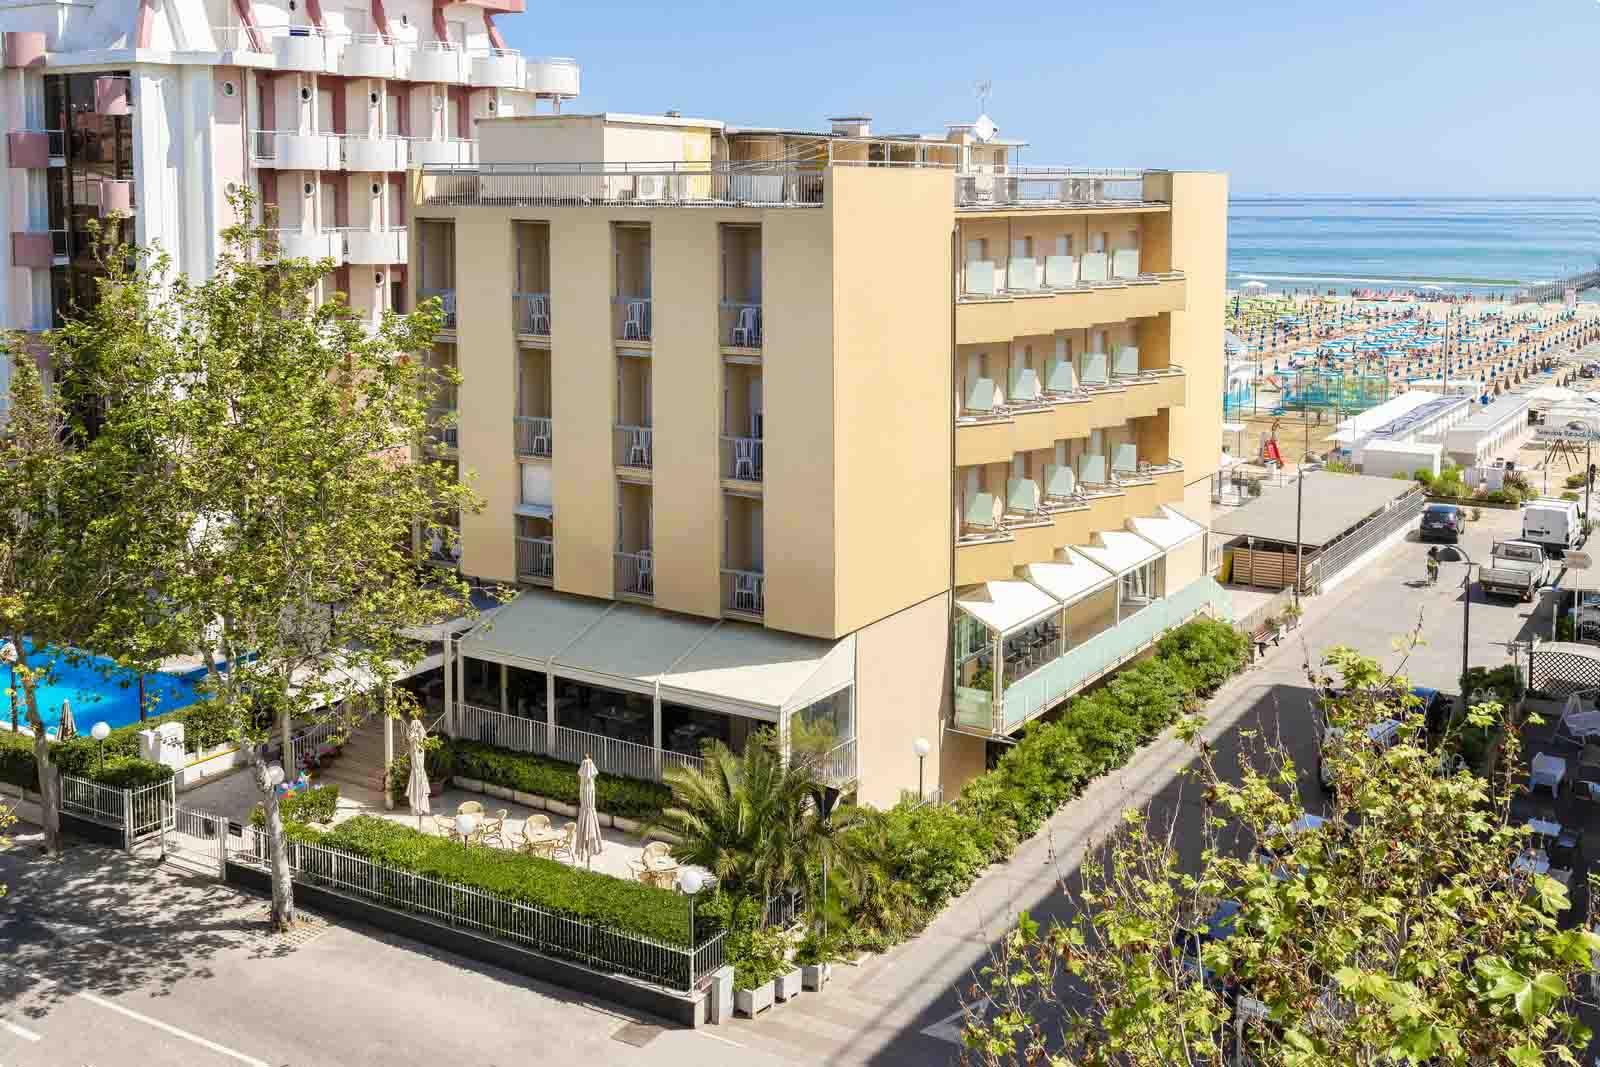 Hotel Haway Rivazzurra Rimini